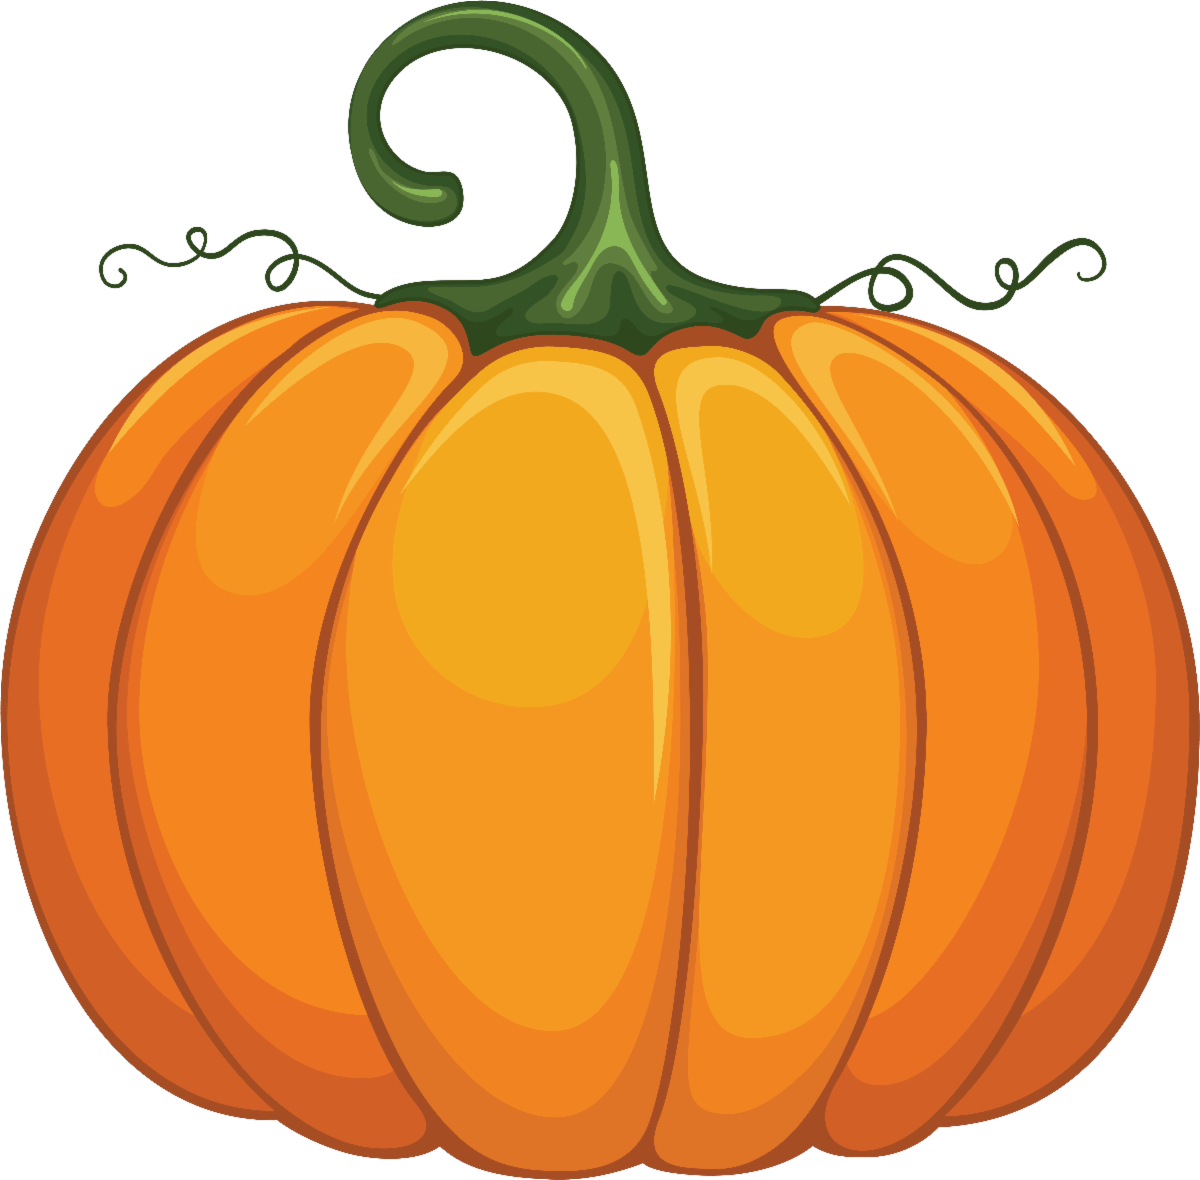 Illustrated graphic of an orange pumpkin